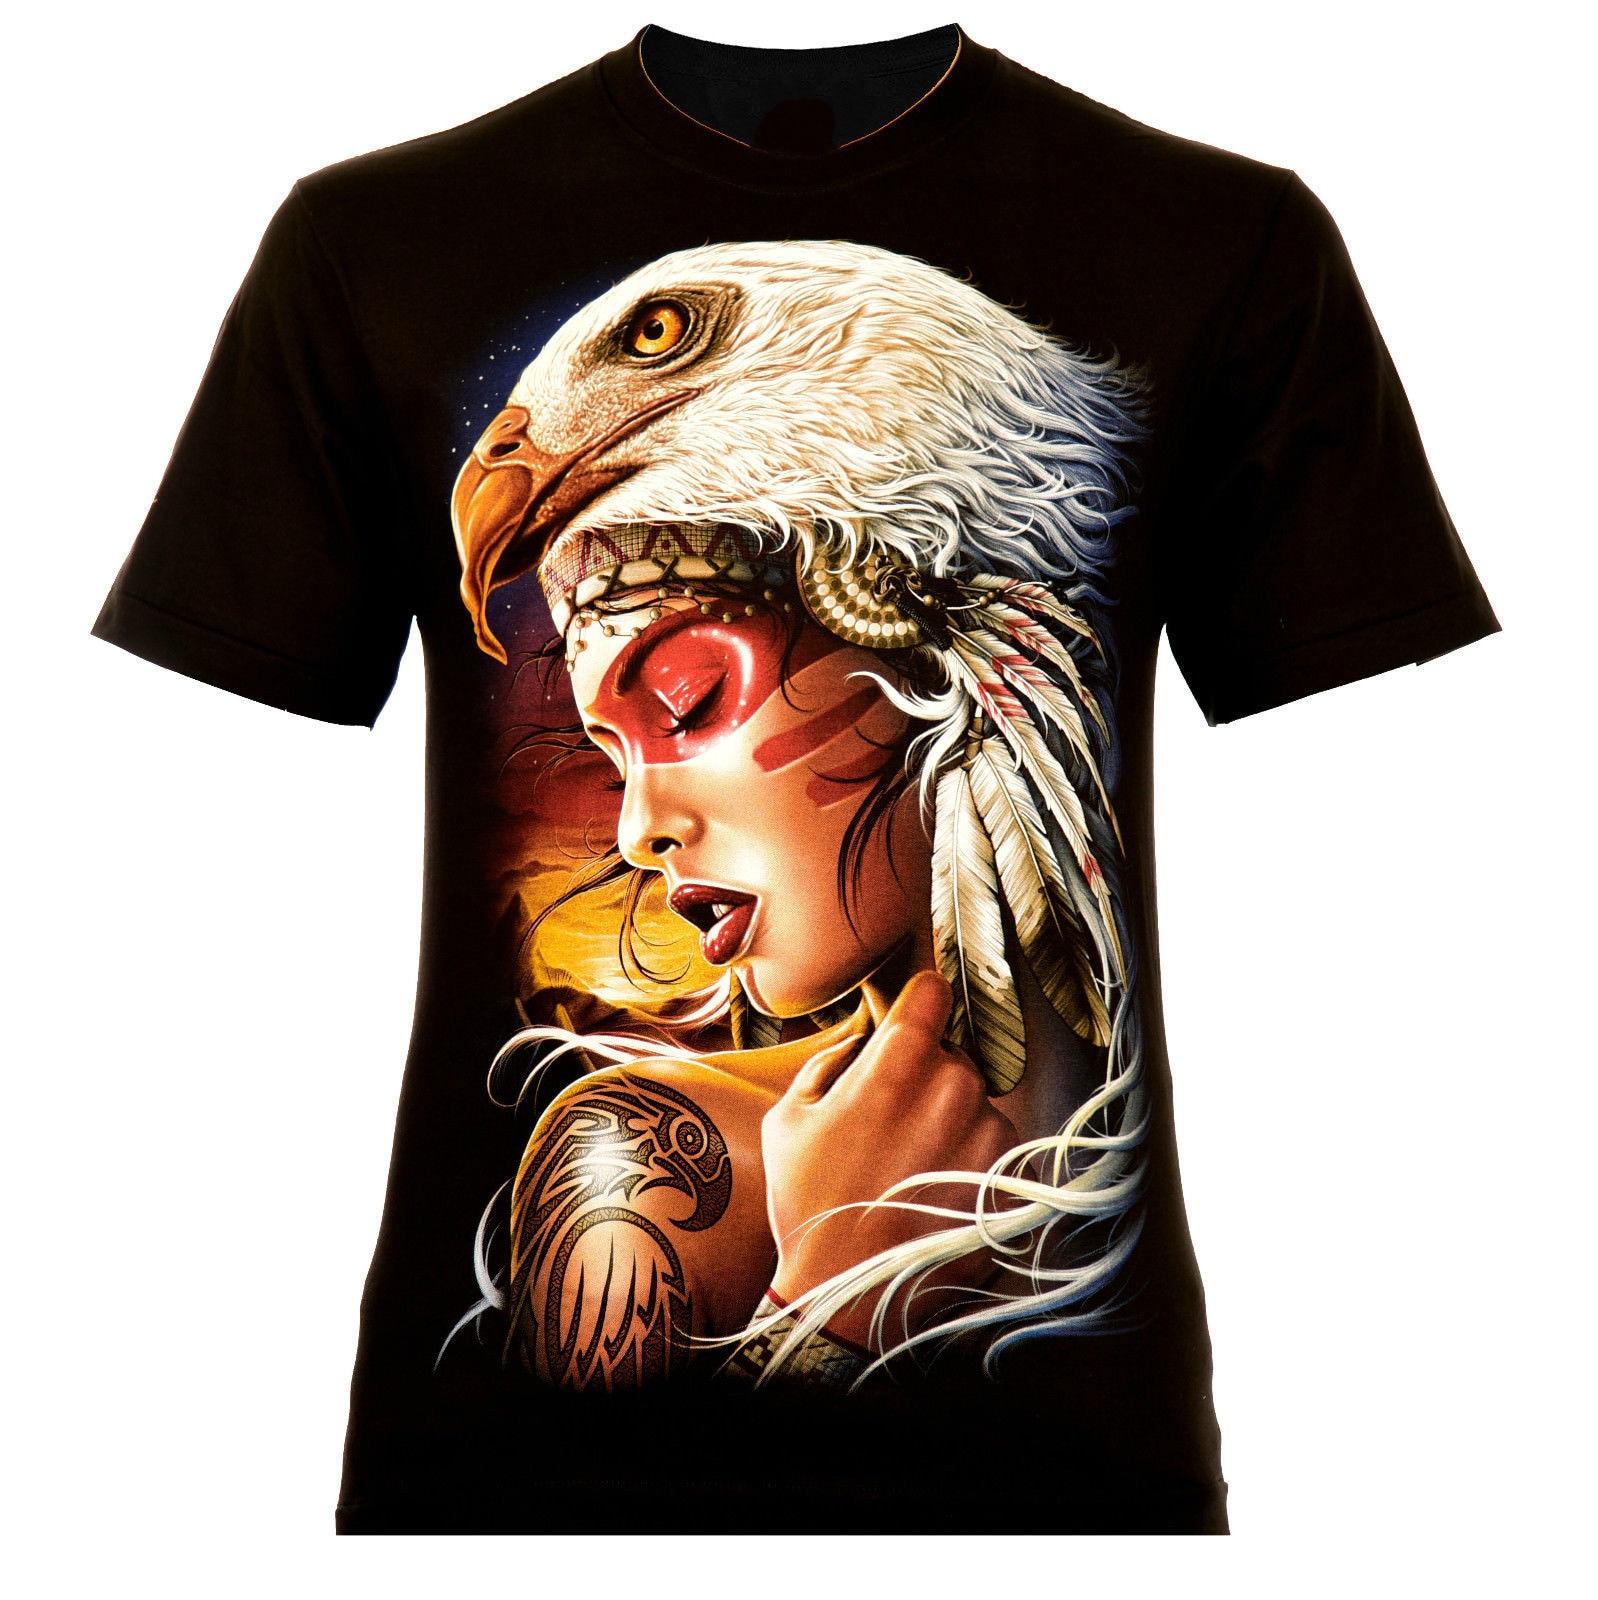 Indigo Eagle Beauty Rock Eagle Black Indian Eagle Tattoo 2018 New Pure Cotton Short Sleeves Hip Hop Fashion Mens T-Shirt